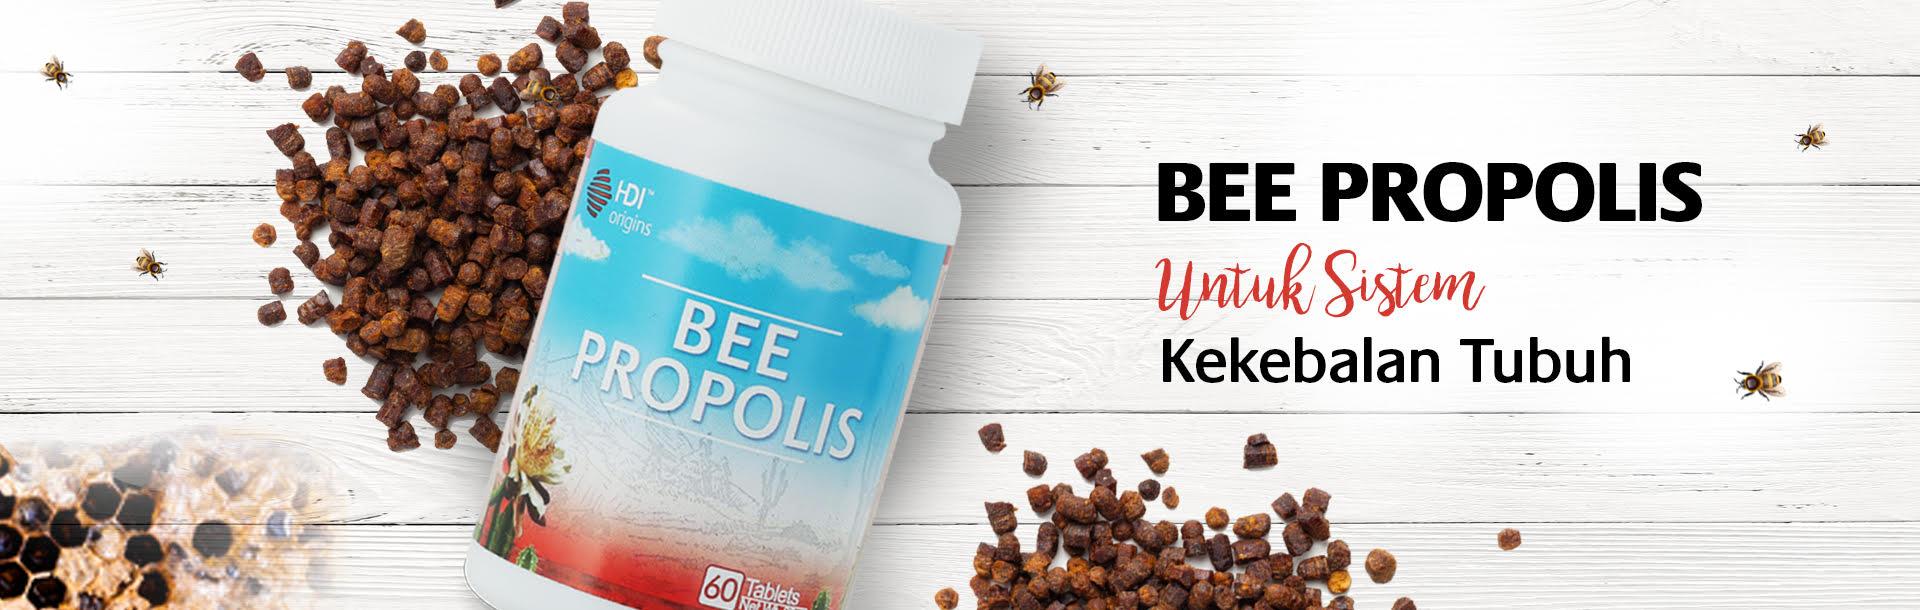 Manfaat Bee Propolis